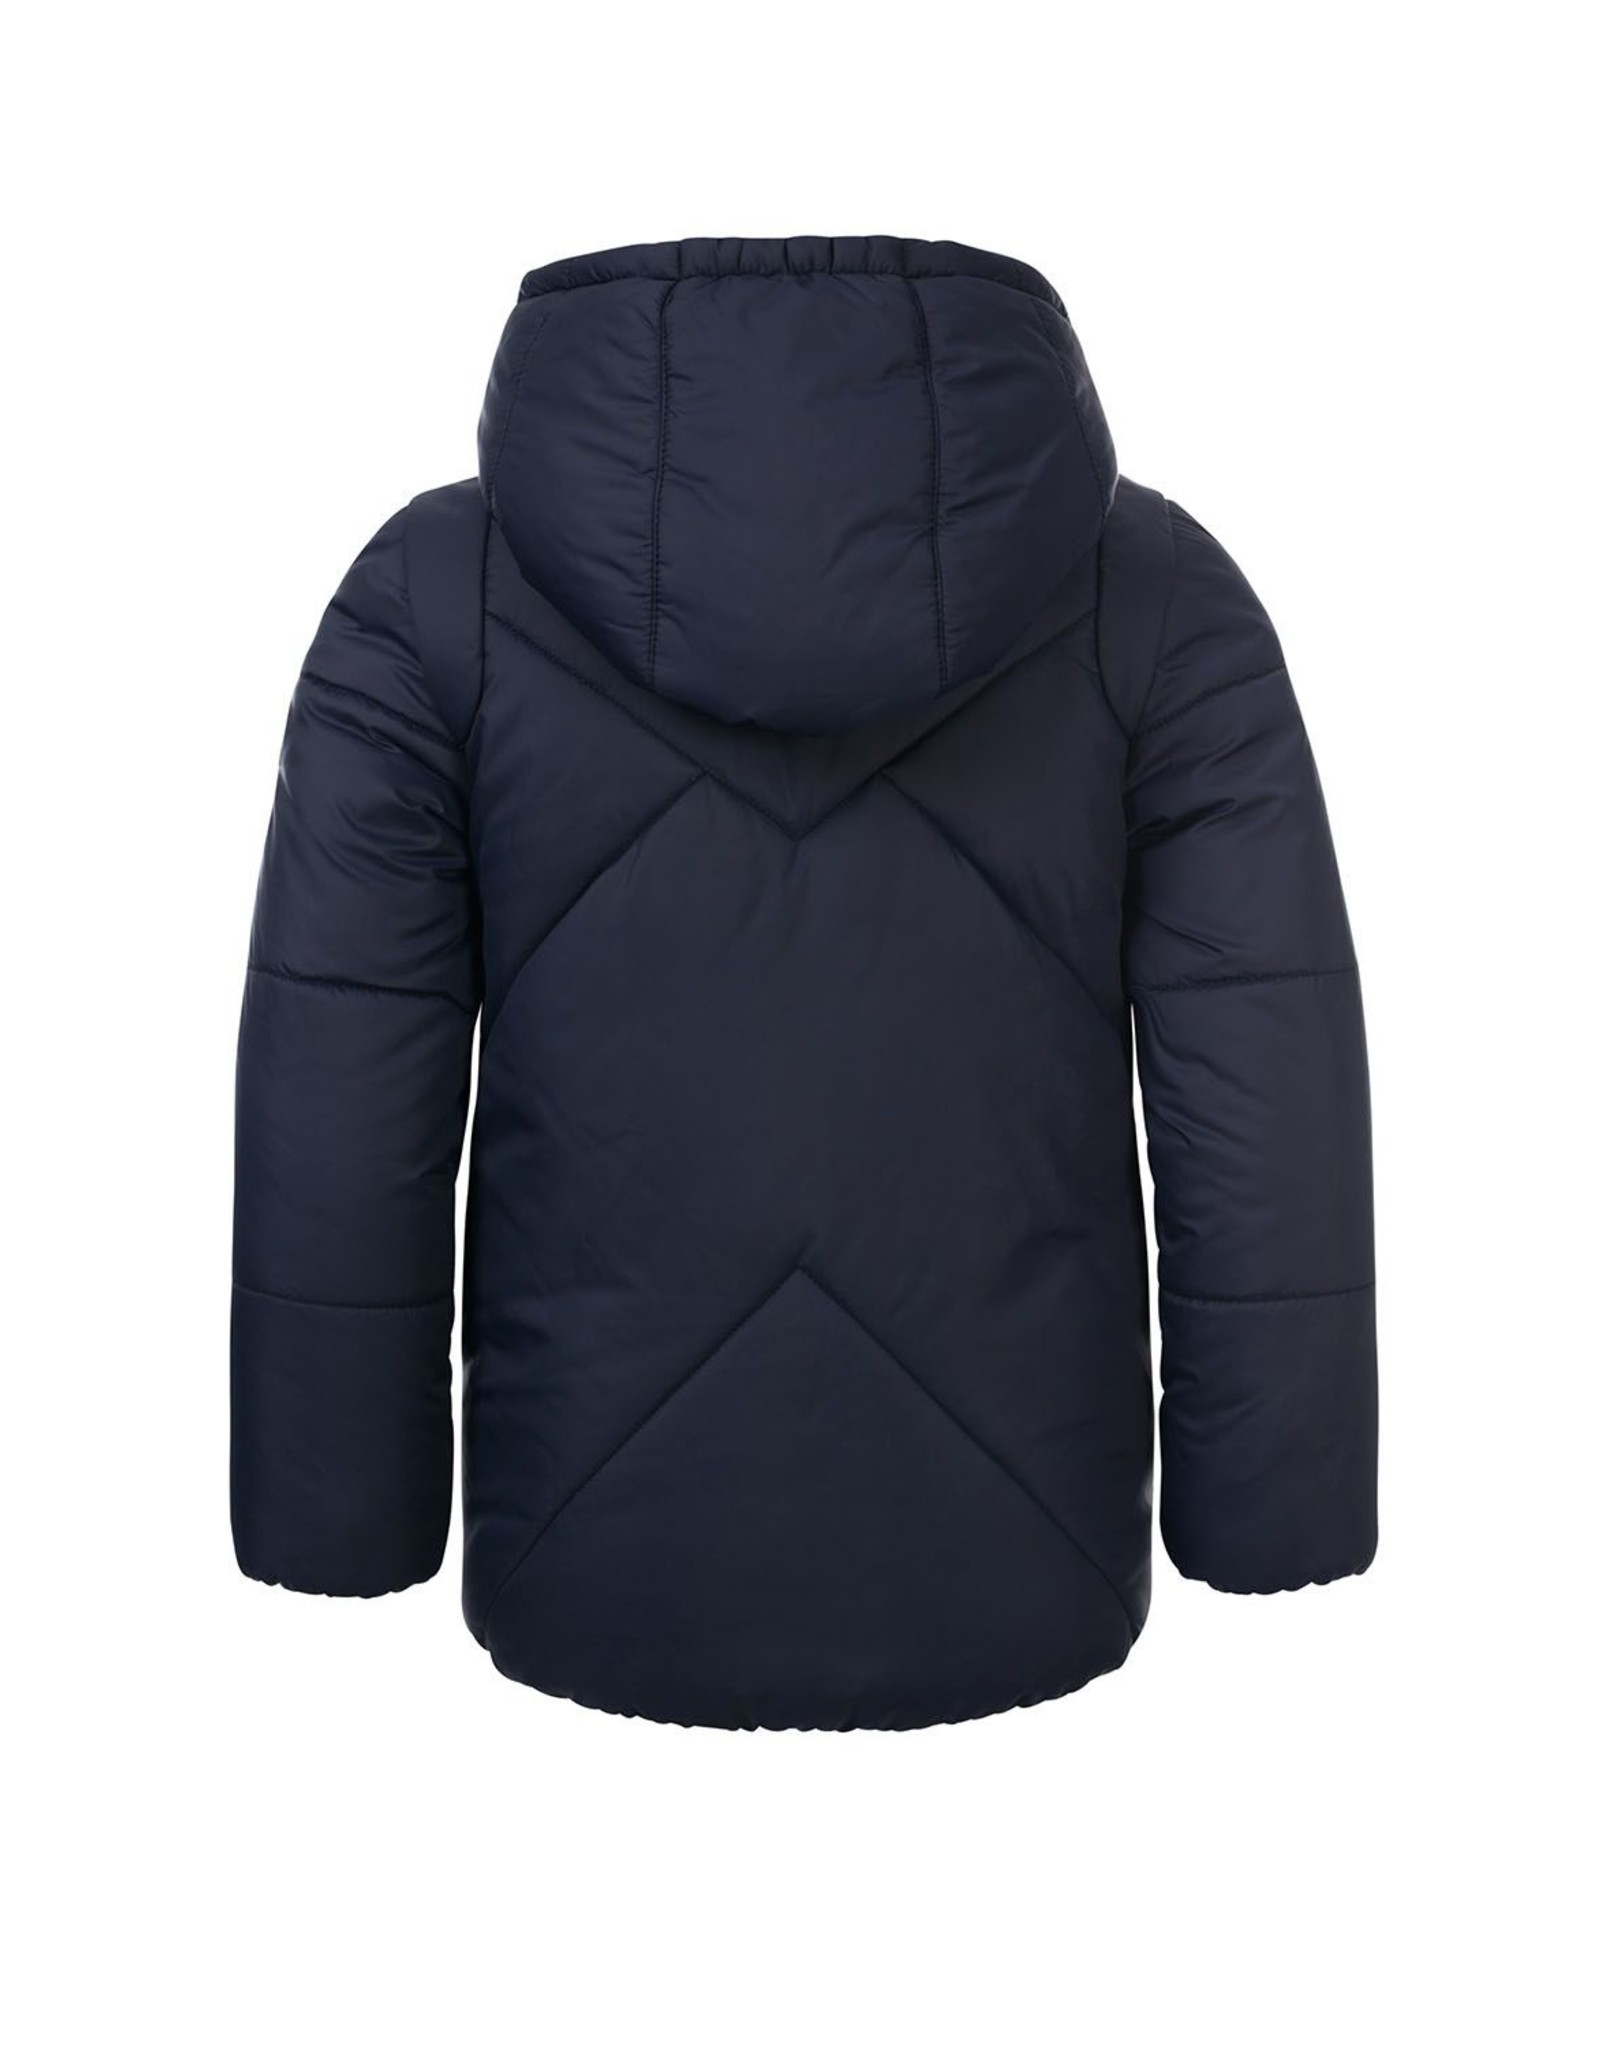 Looxs Little Little jacket Navy